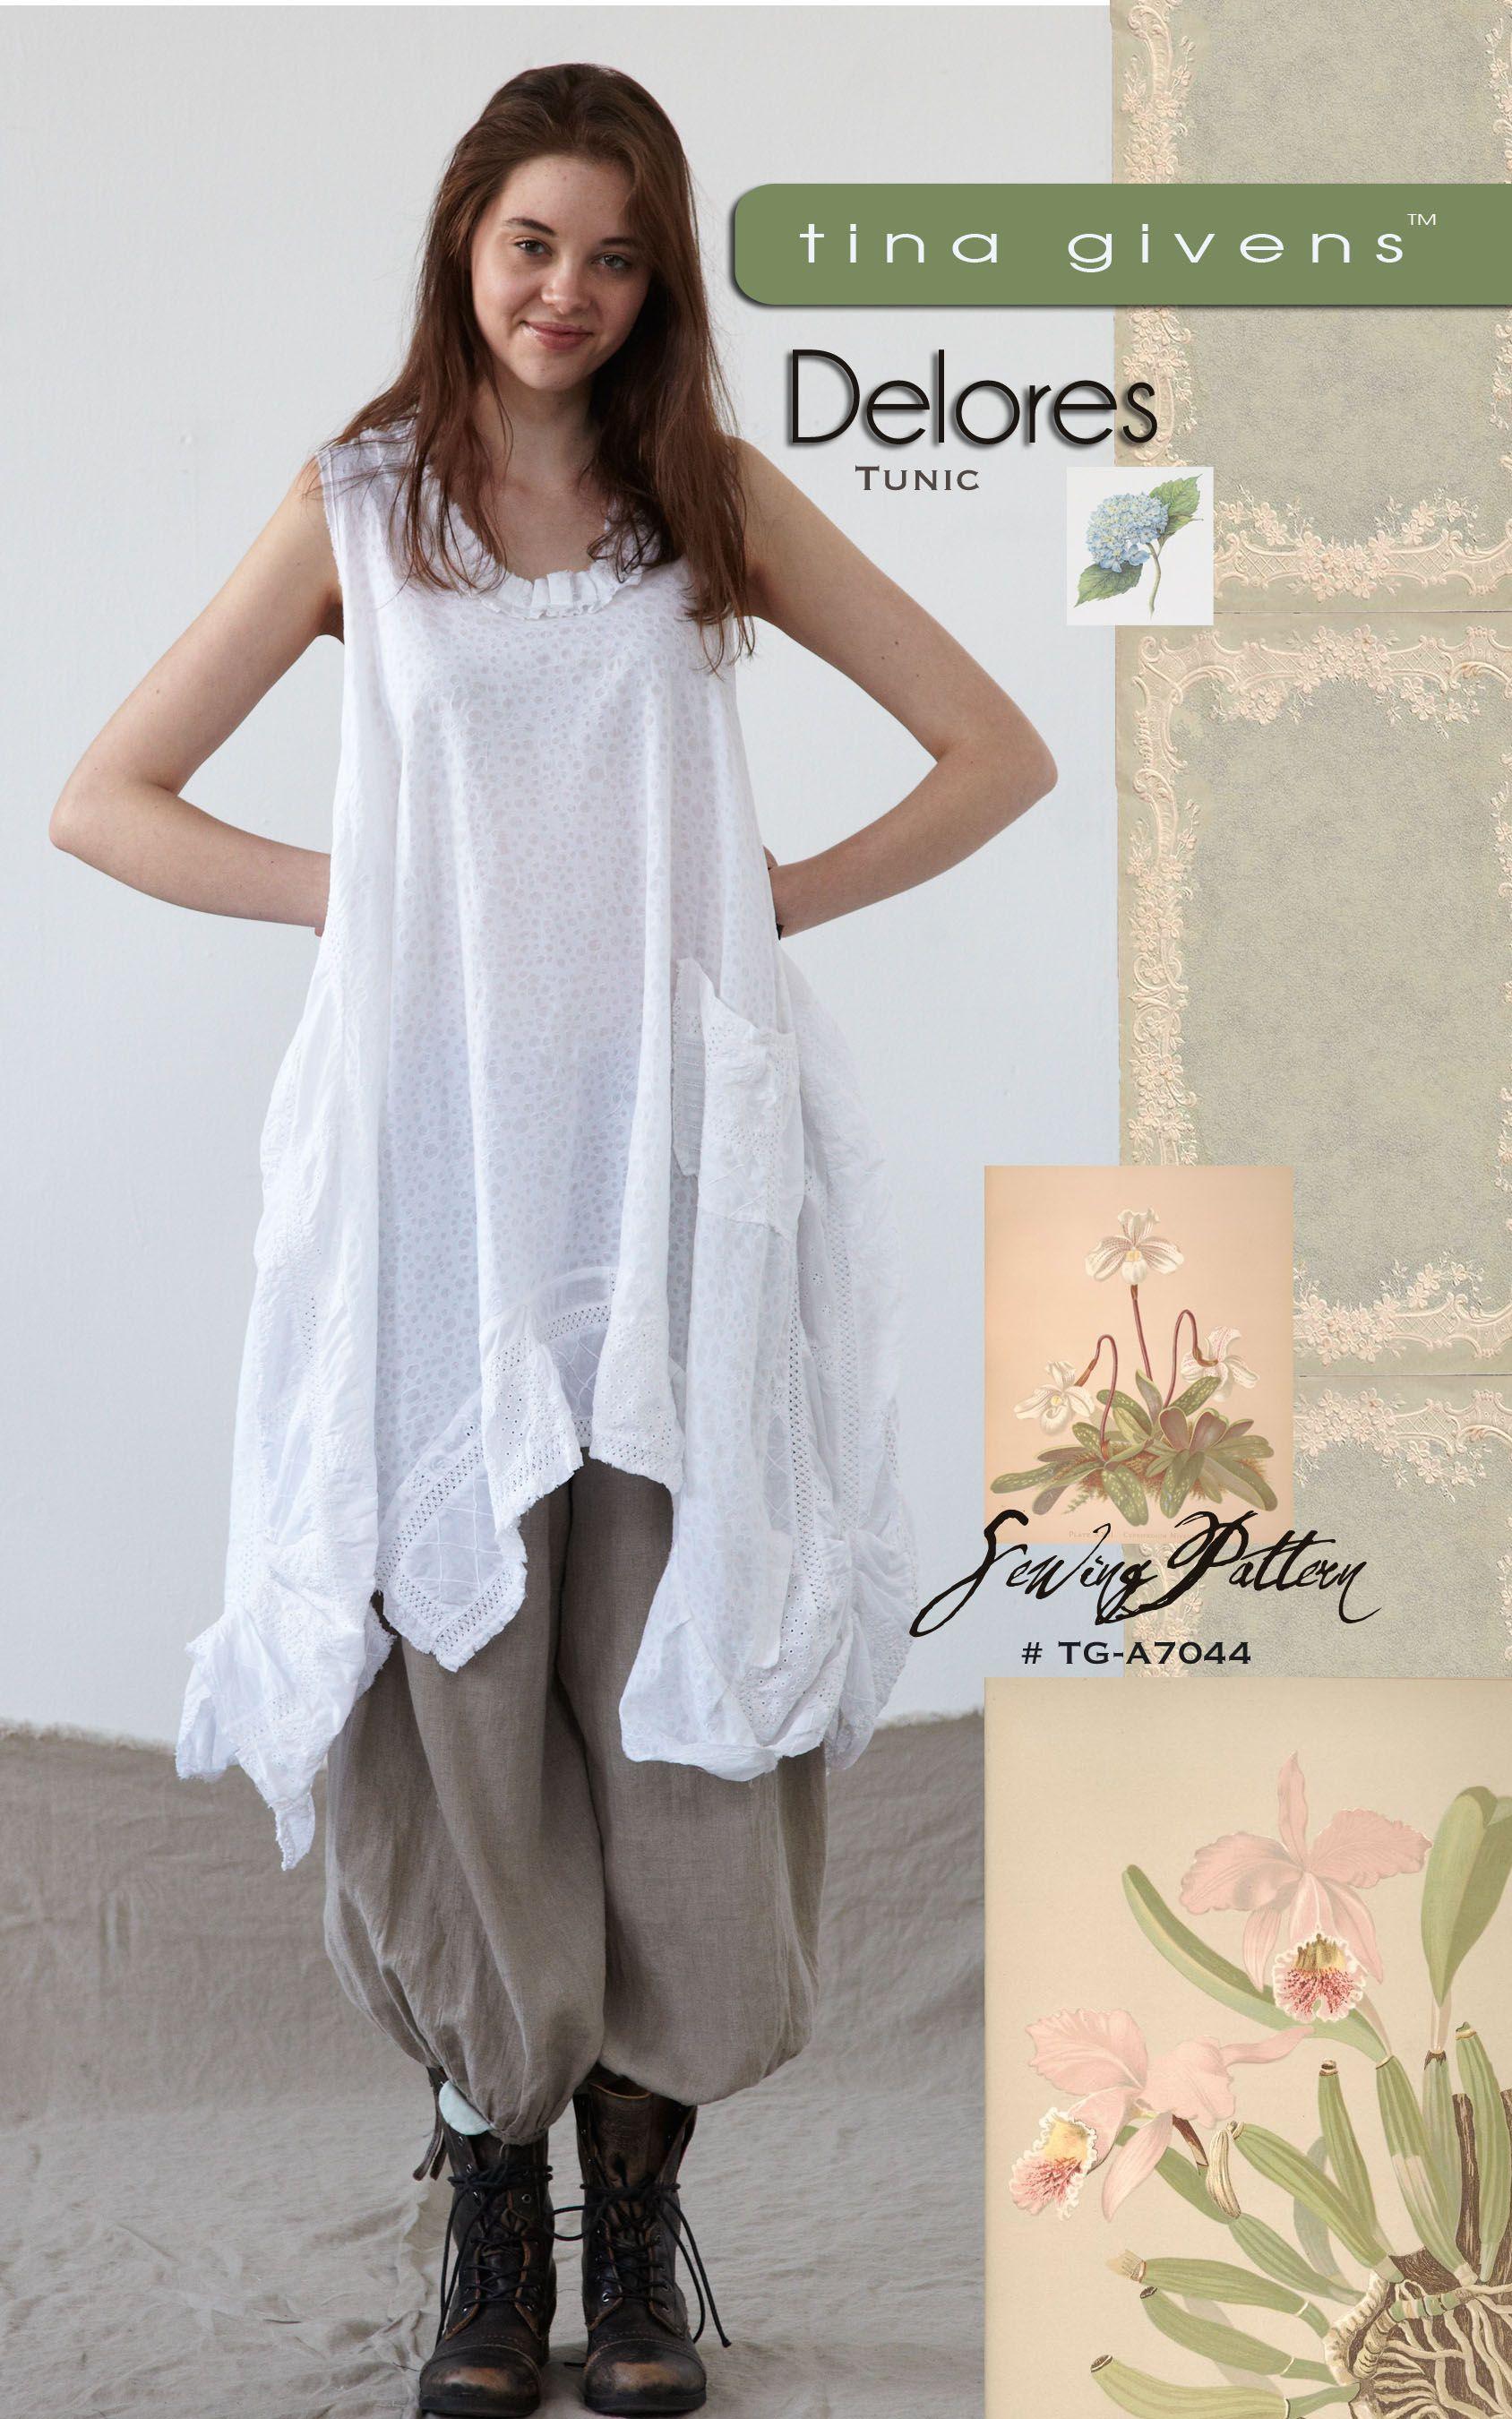 TG-A7044 DELORES | Clothing | Pinterest